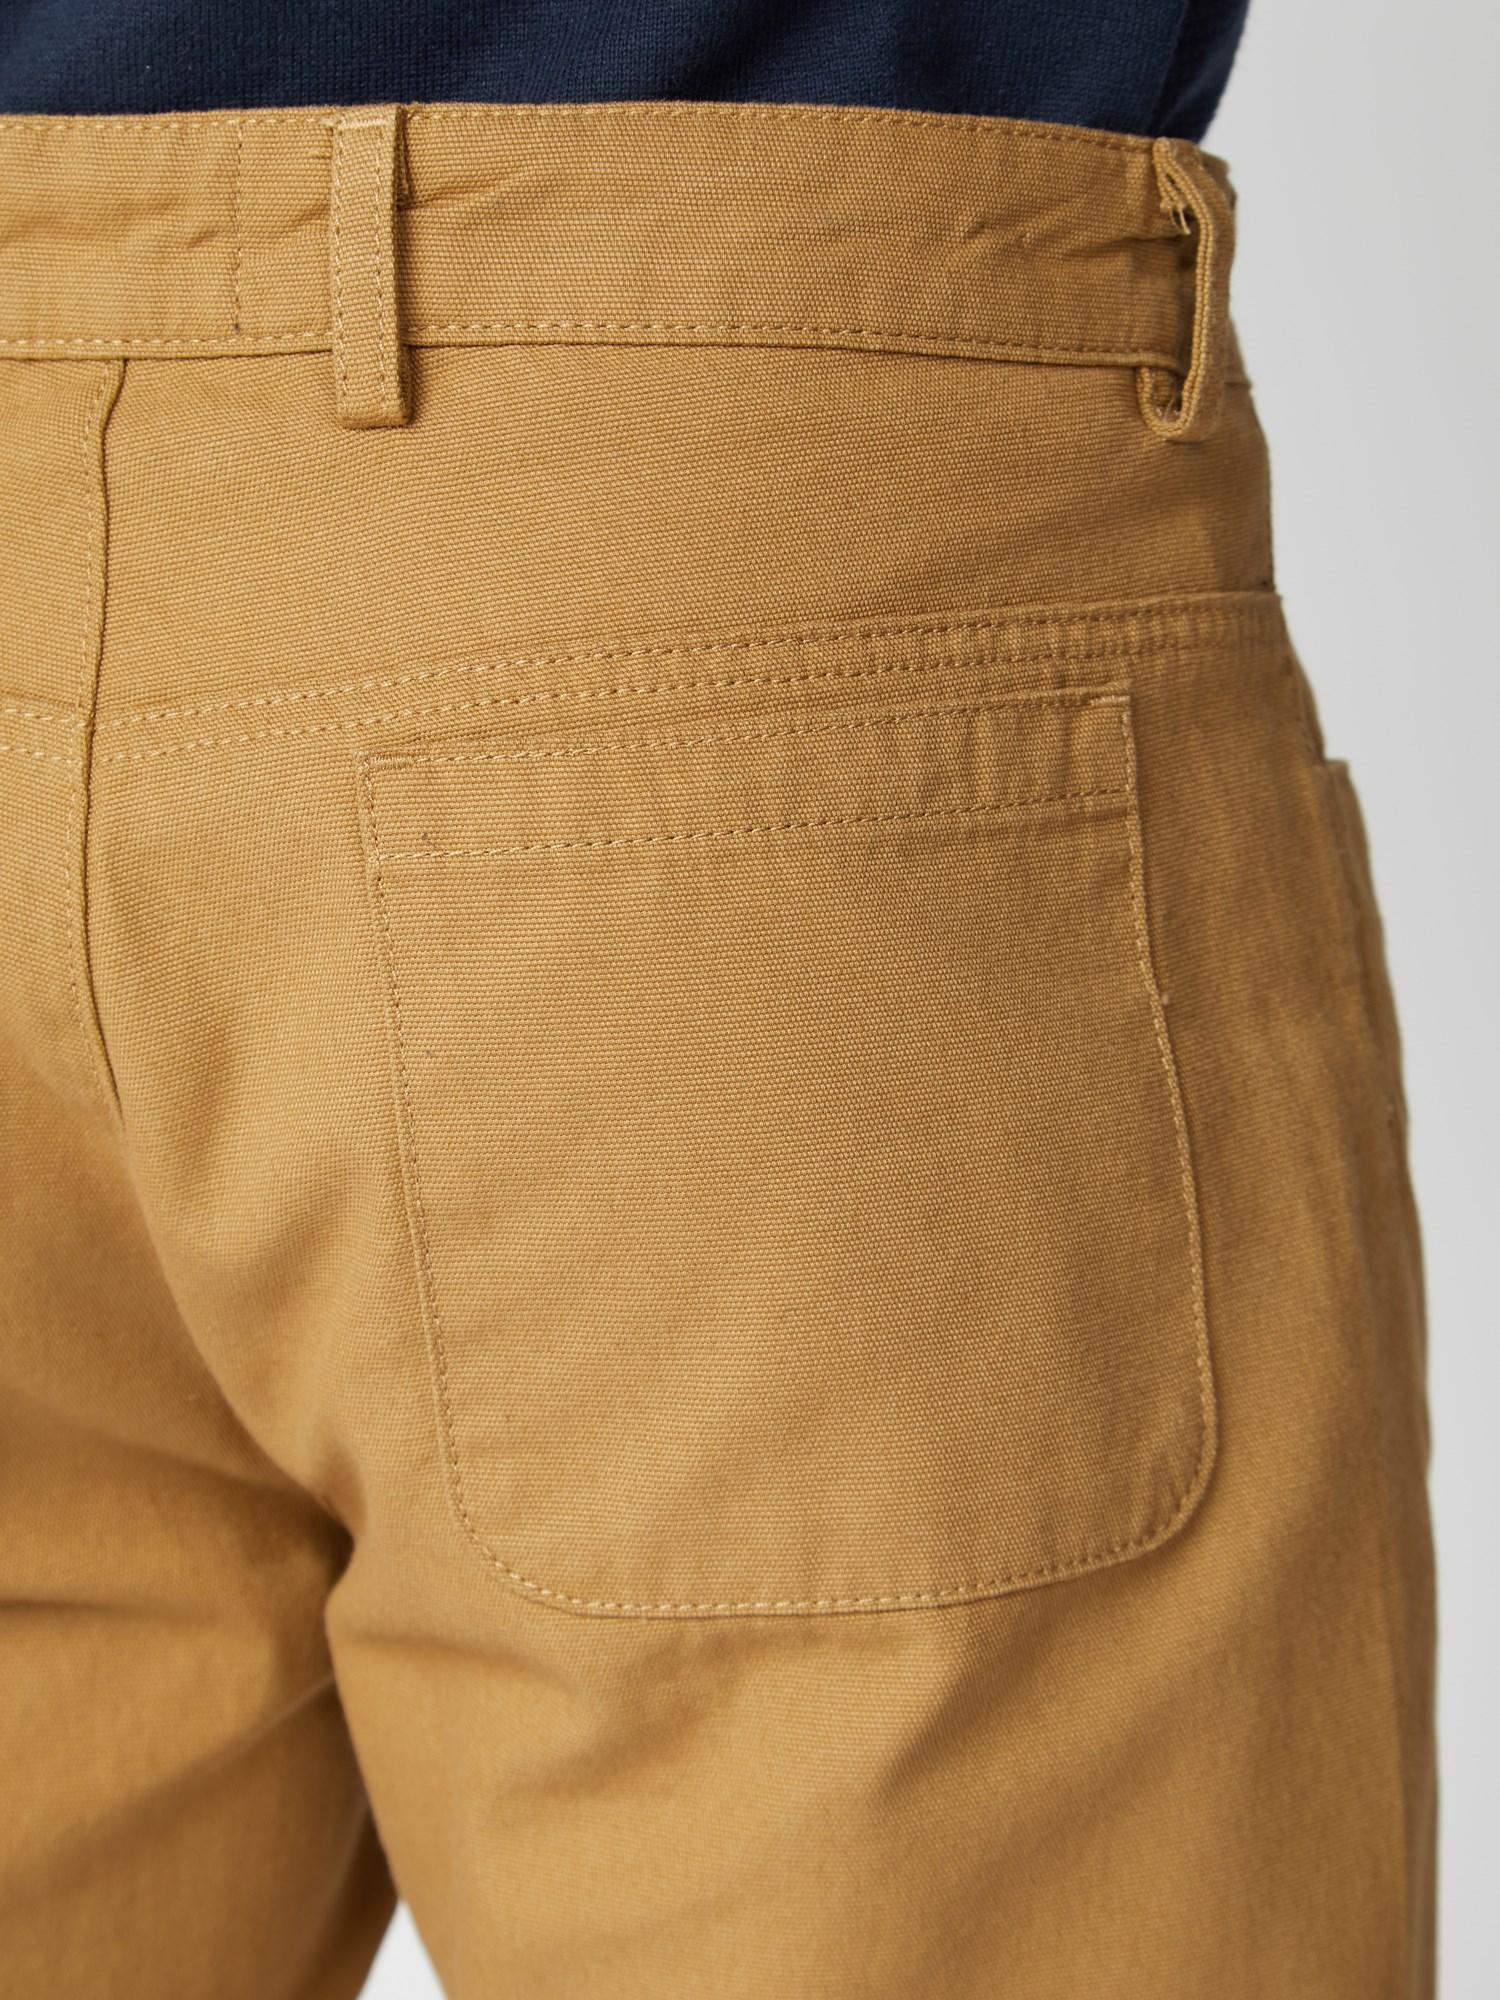 Plain Canvas Shorts